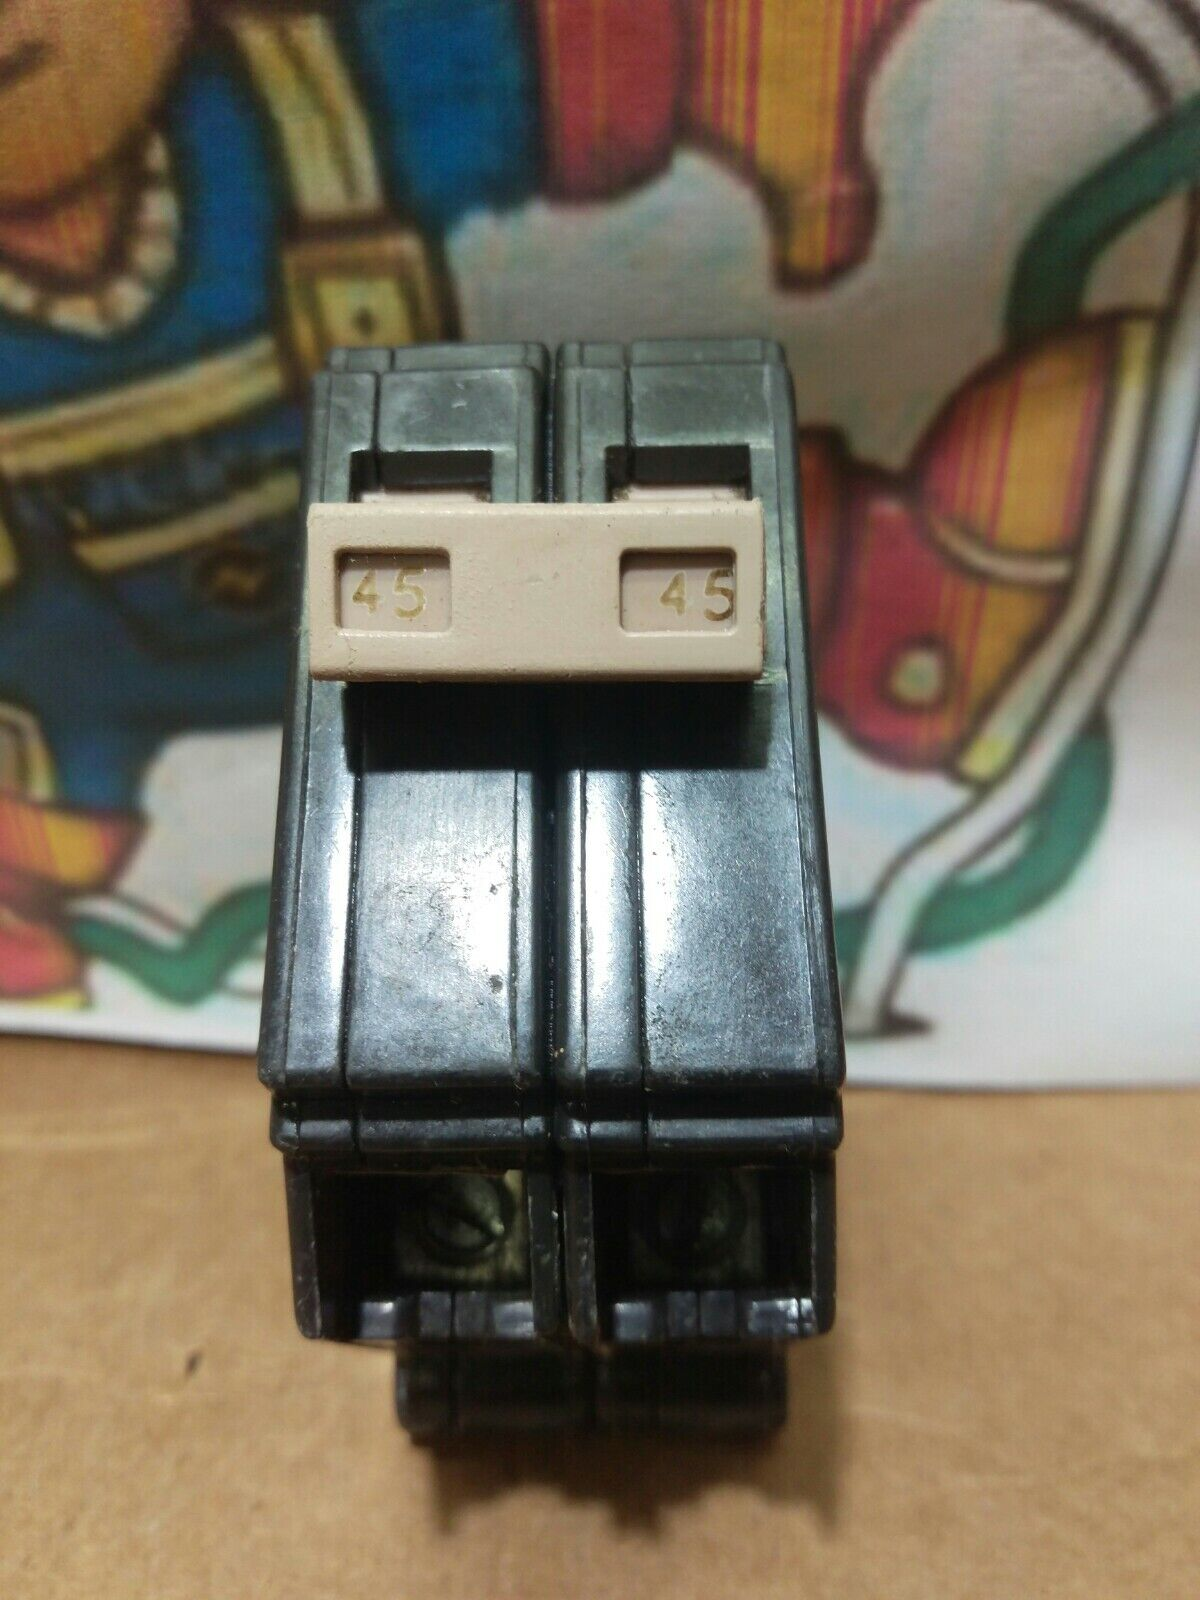 Cutler Hammer CH245 Double Pole 120V 45 Amp Plug-On Circuit Breaker